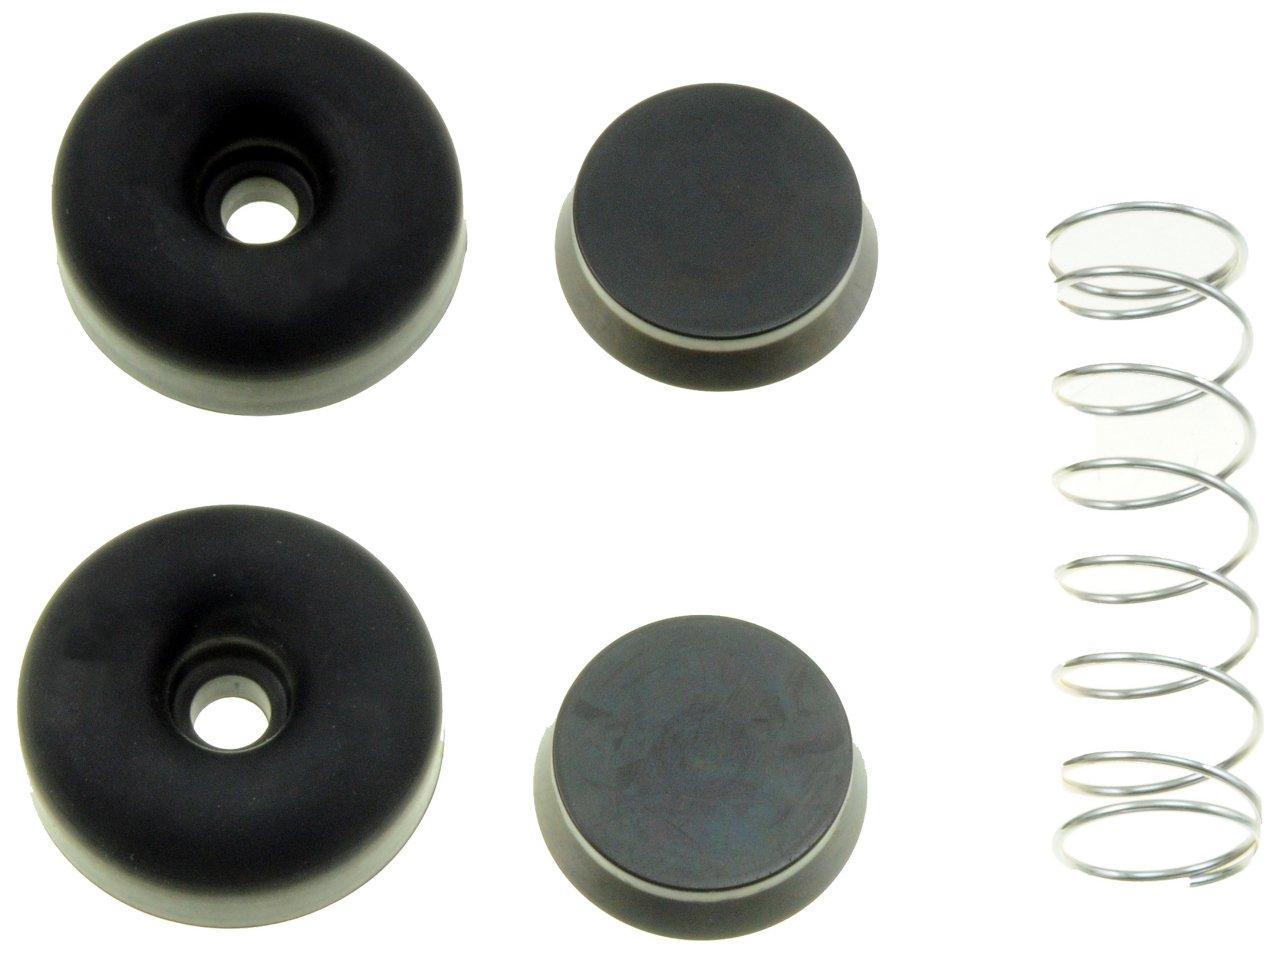 Dorman 13620 Drum Brake Wheel Cylinder Repair Kit Dorman - First Stop